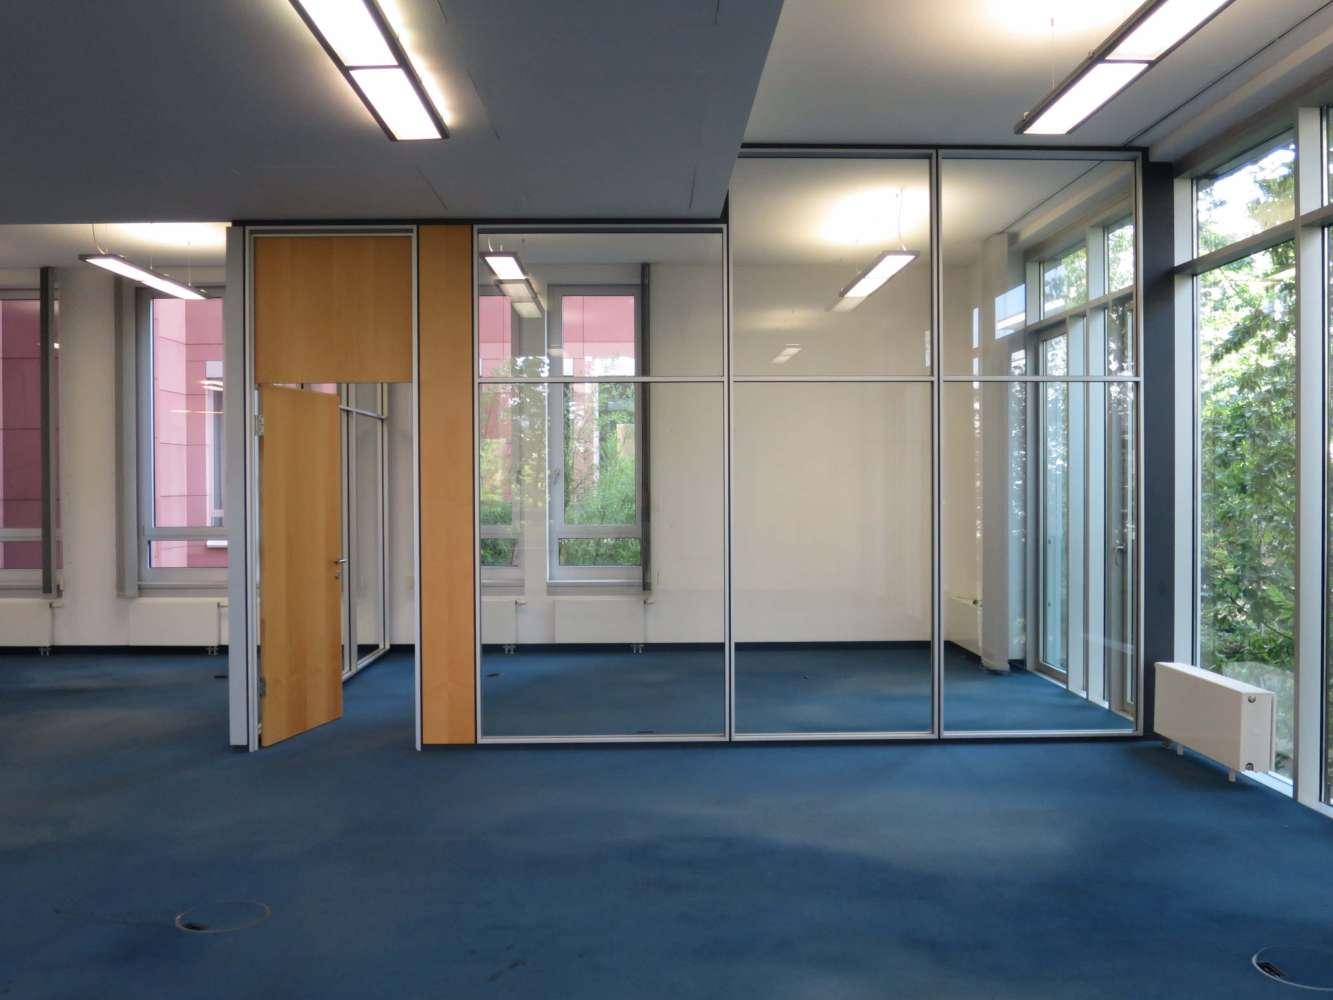 Büros Frankfurt am main, 60598 - Büro - Frankfurt am Main, Sachsenhausen - F2166 - 10641782